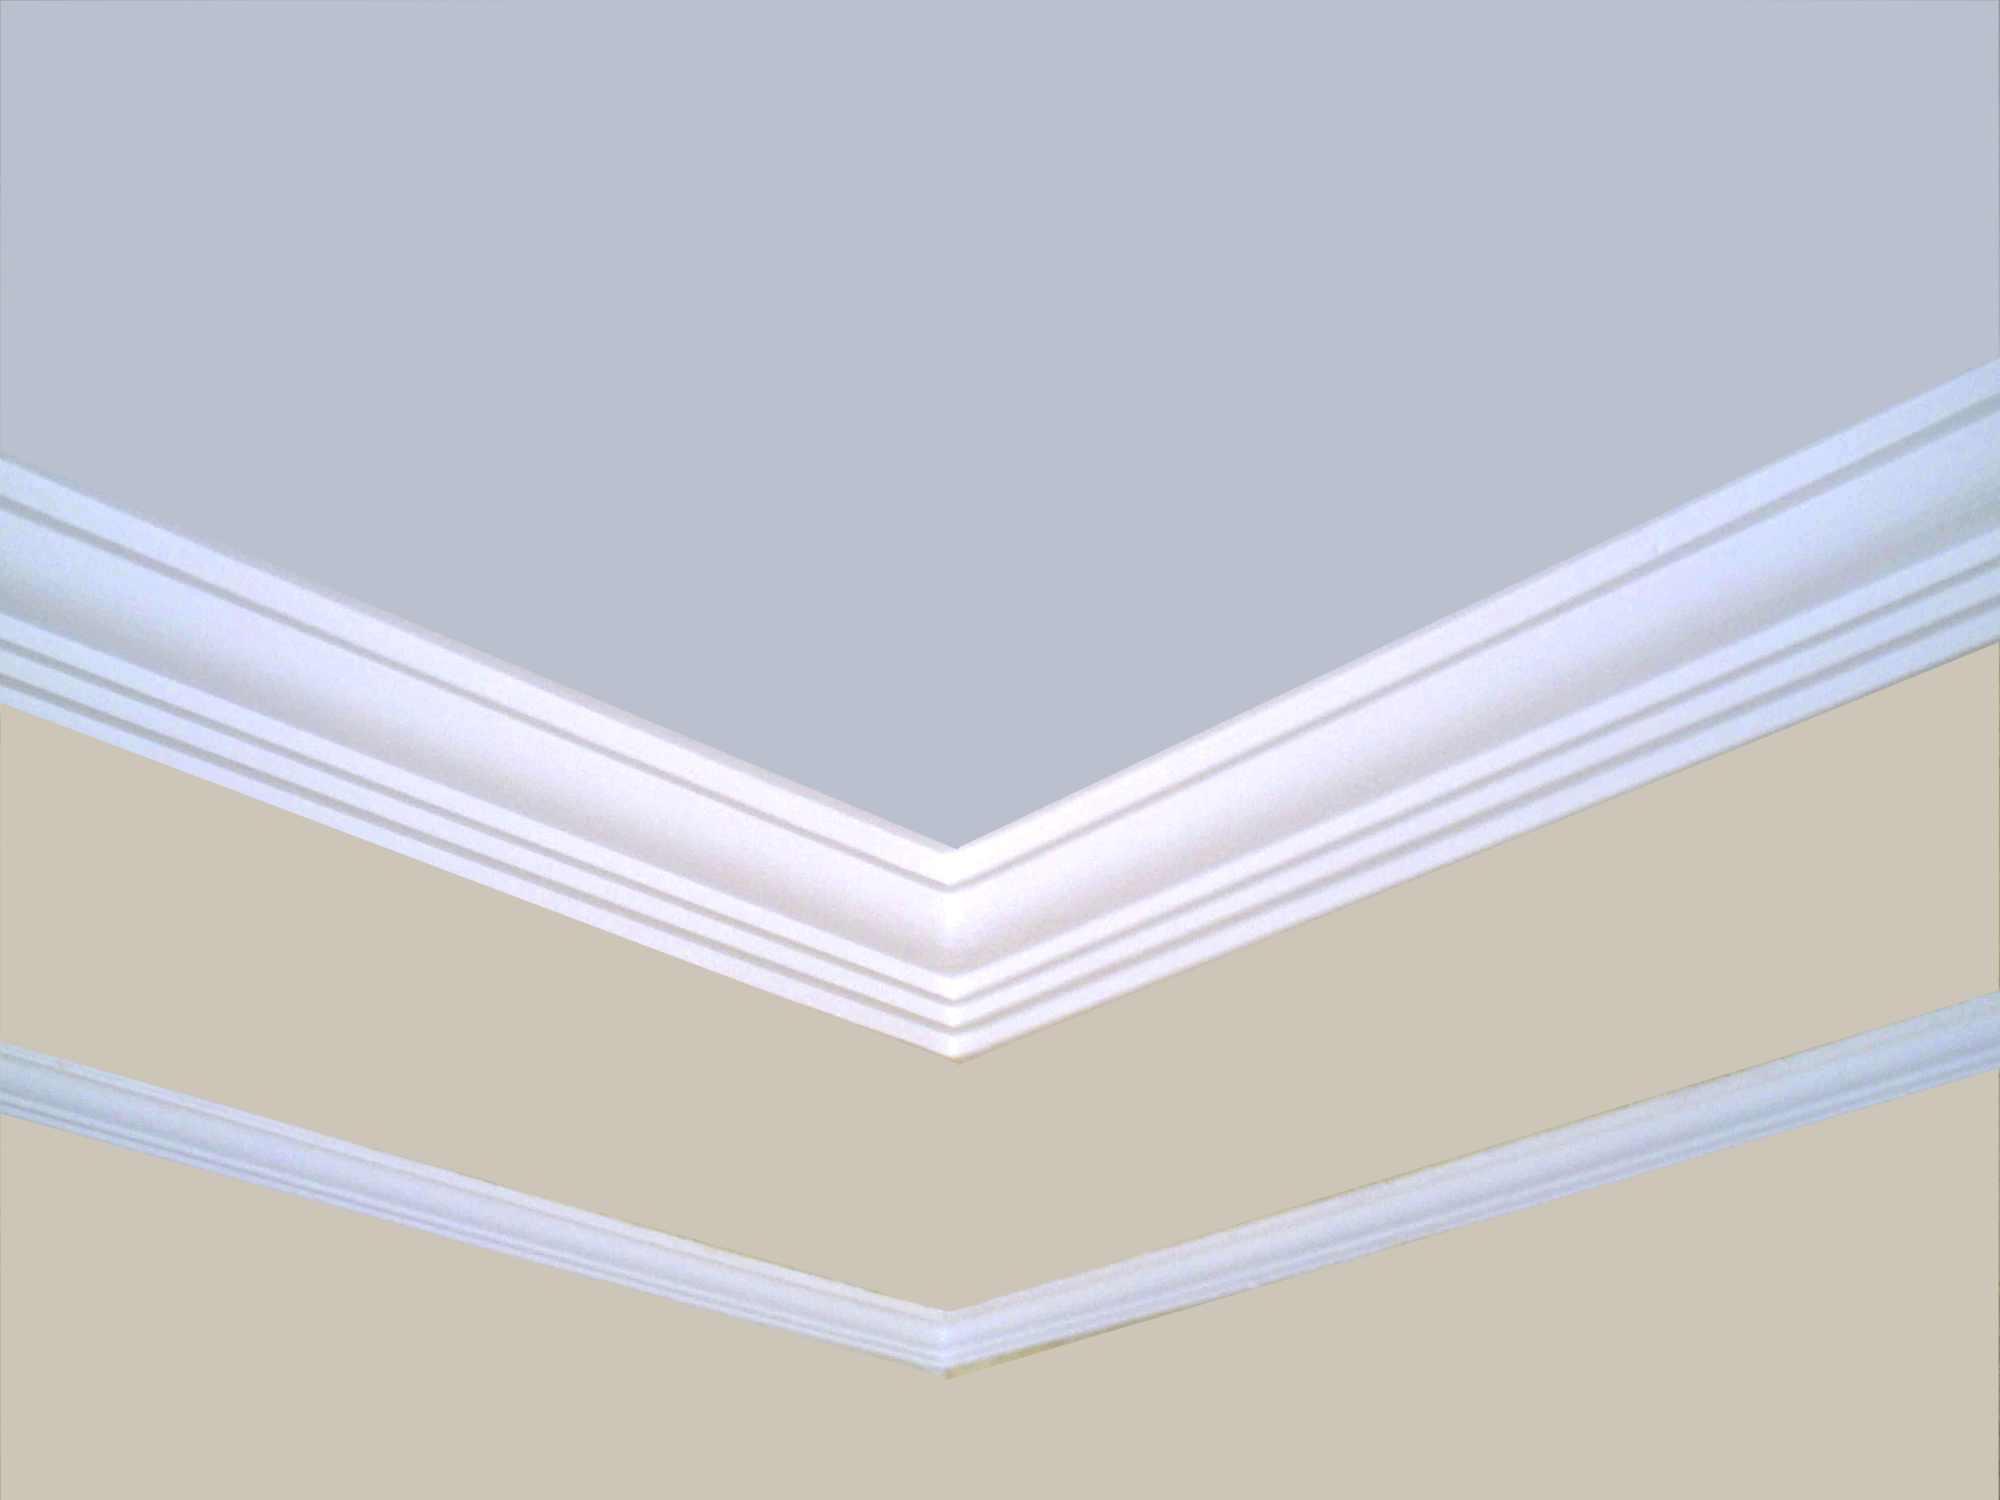 Gesso Liso Molduras e Sancas Rebaixamento de Teto Drywall #787153 2000 1500